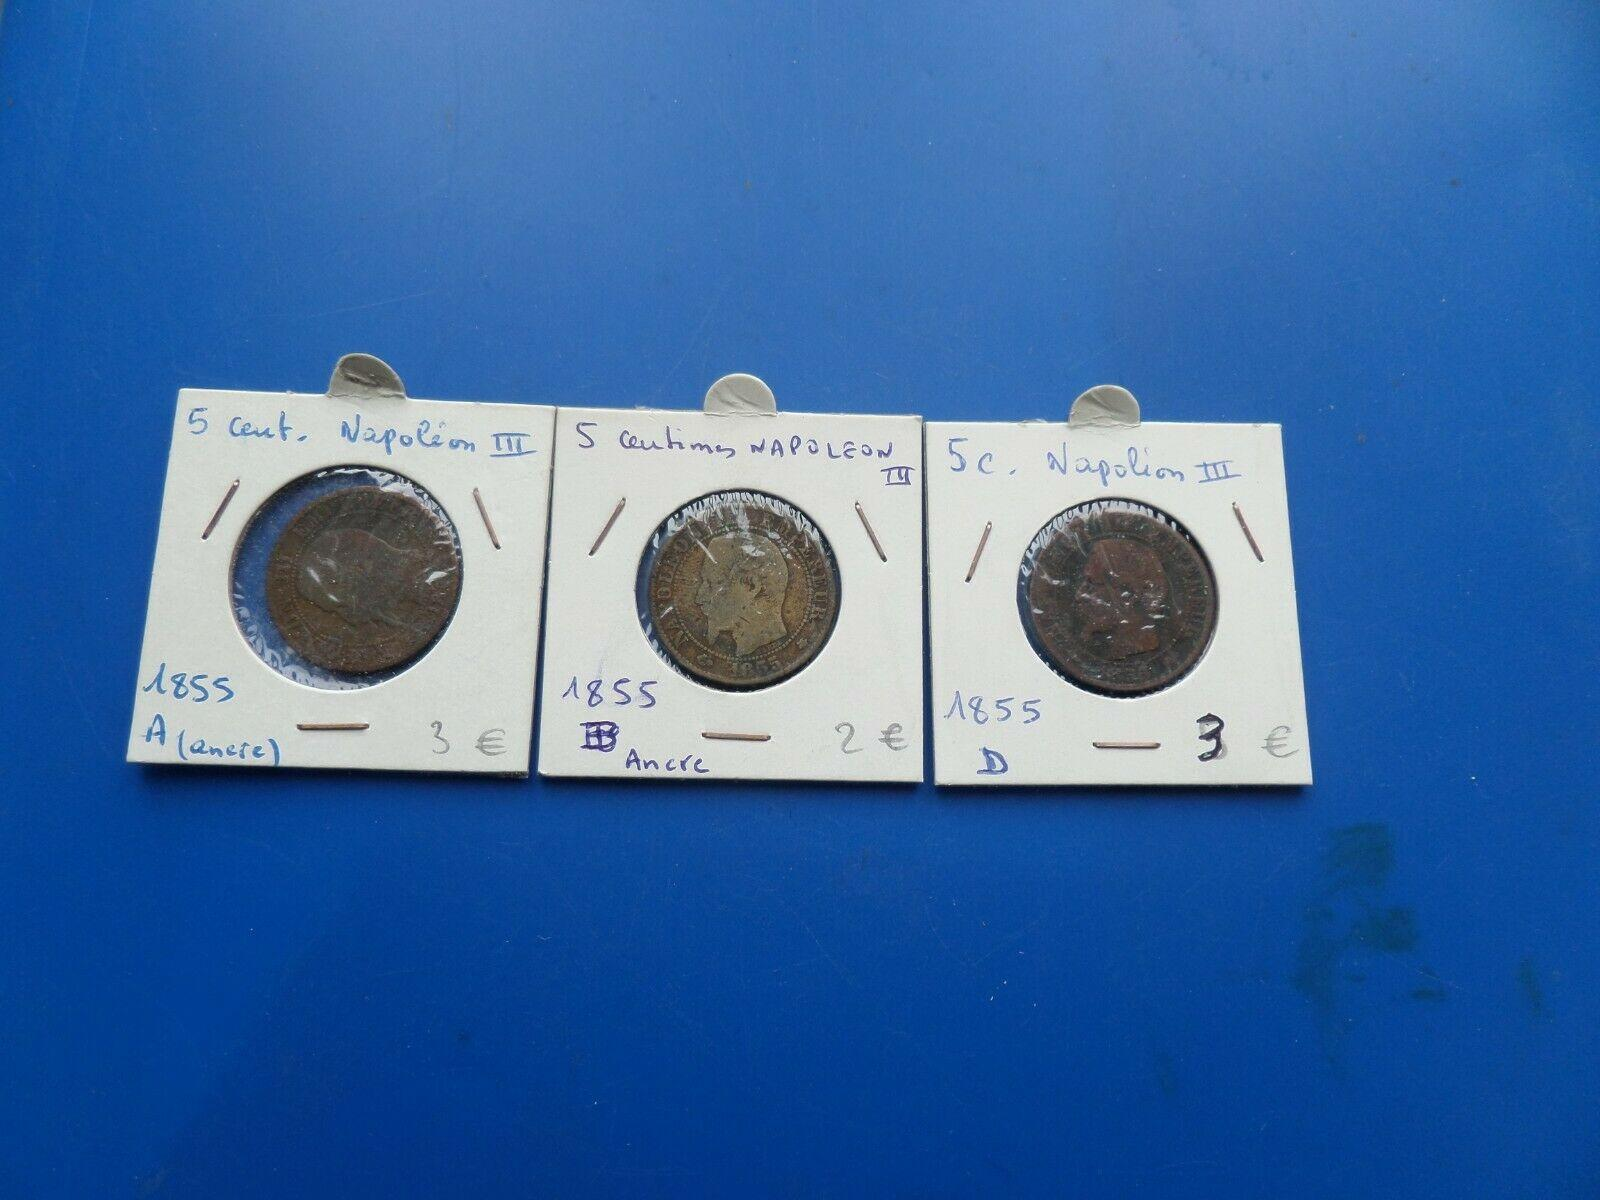 5 centimes napoleon iii 8